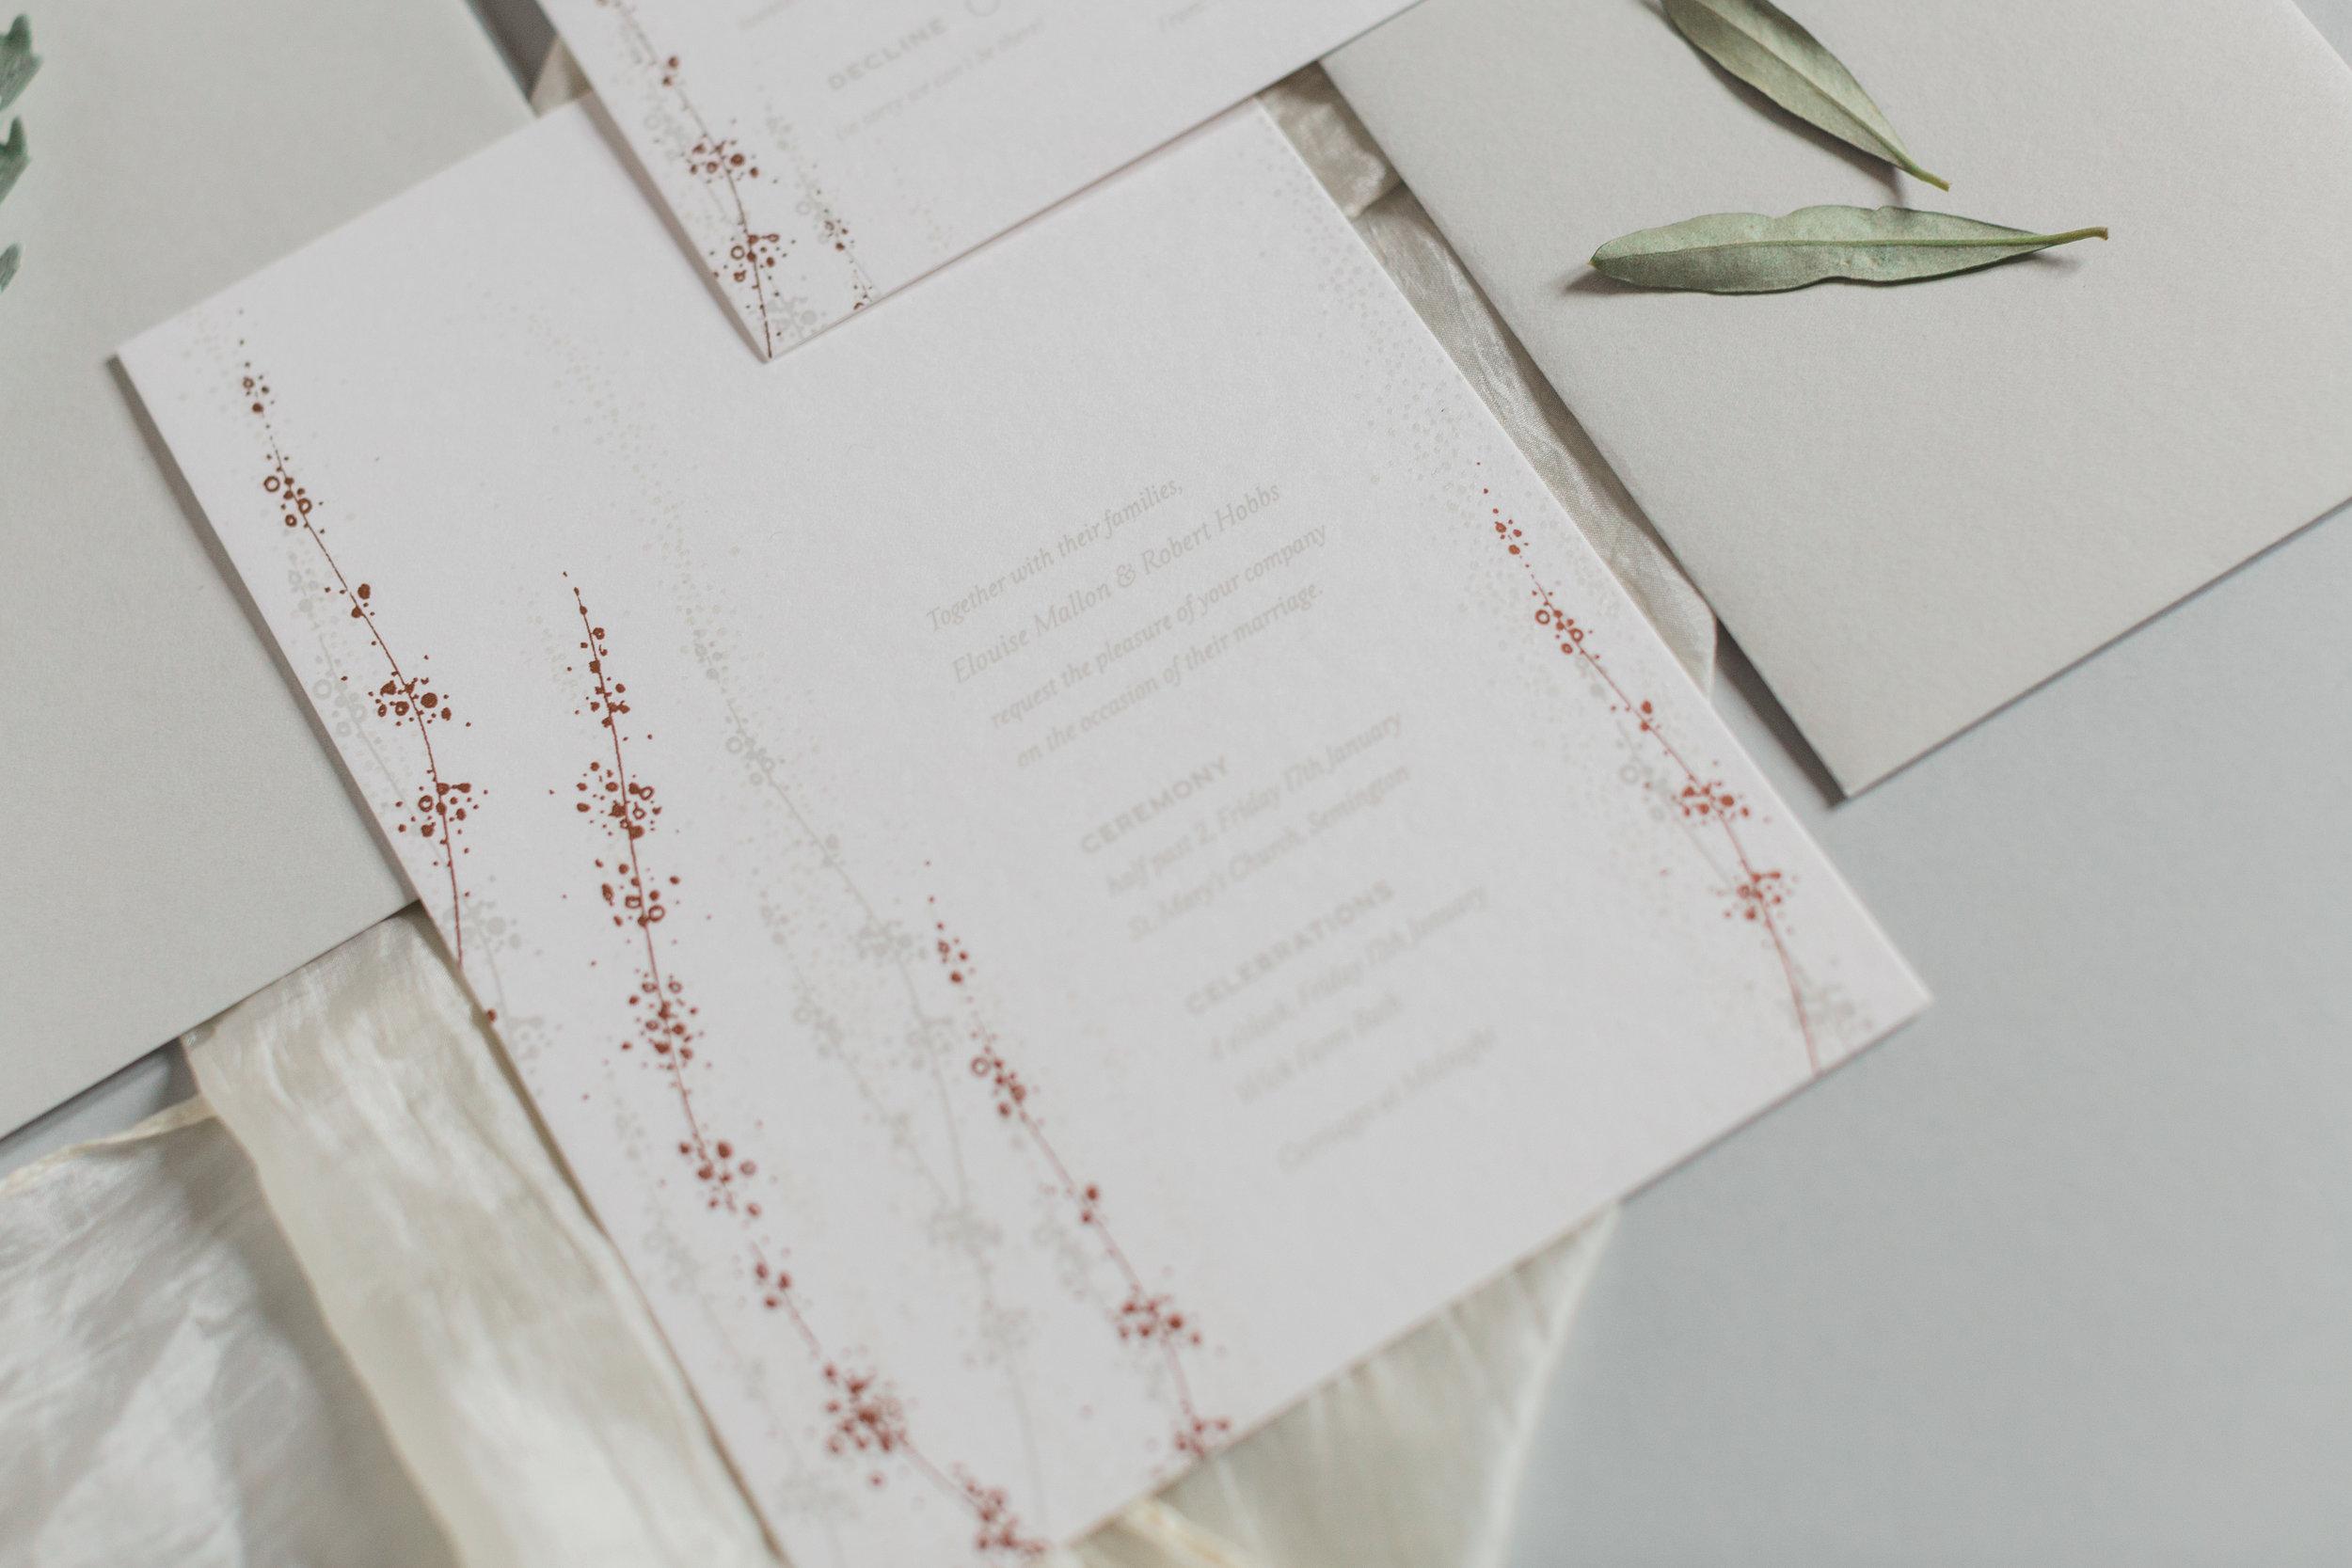 Inkflower Press silkscreen printed Winter Seedheads wedding invitation suite - Copper